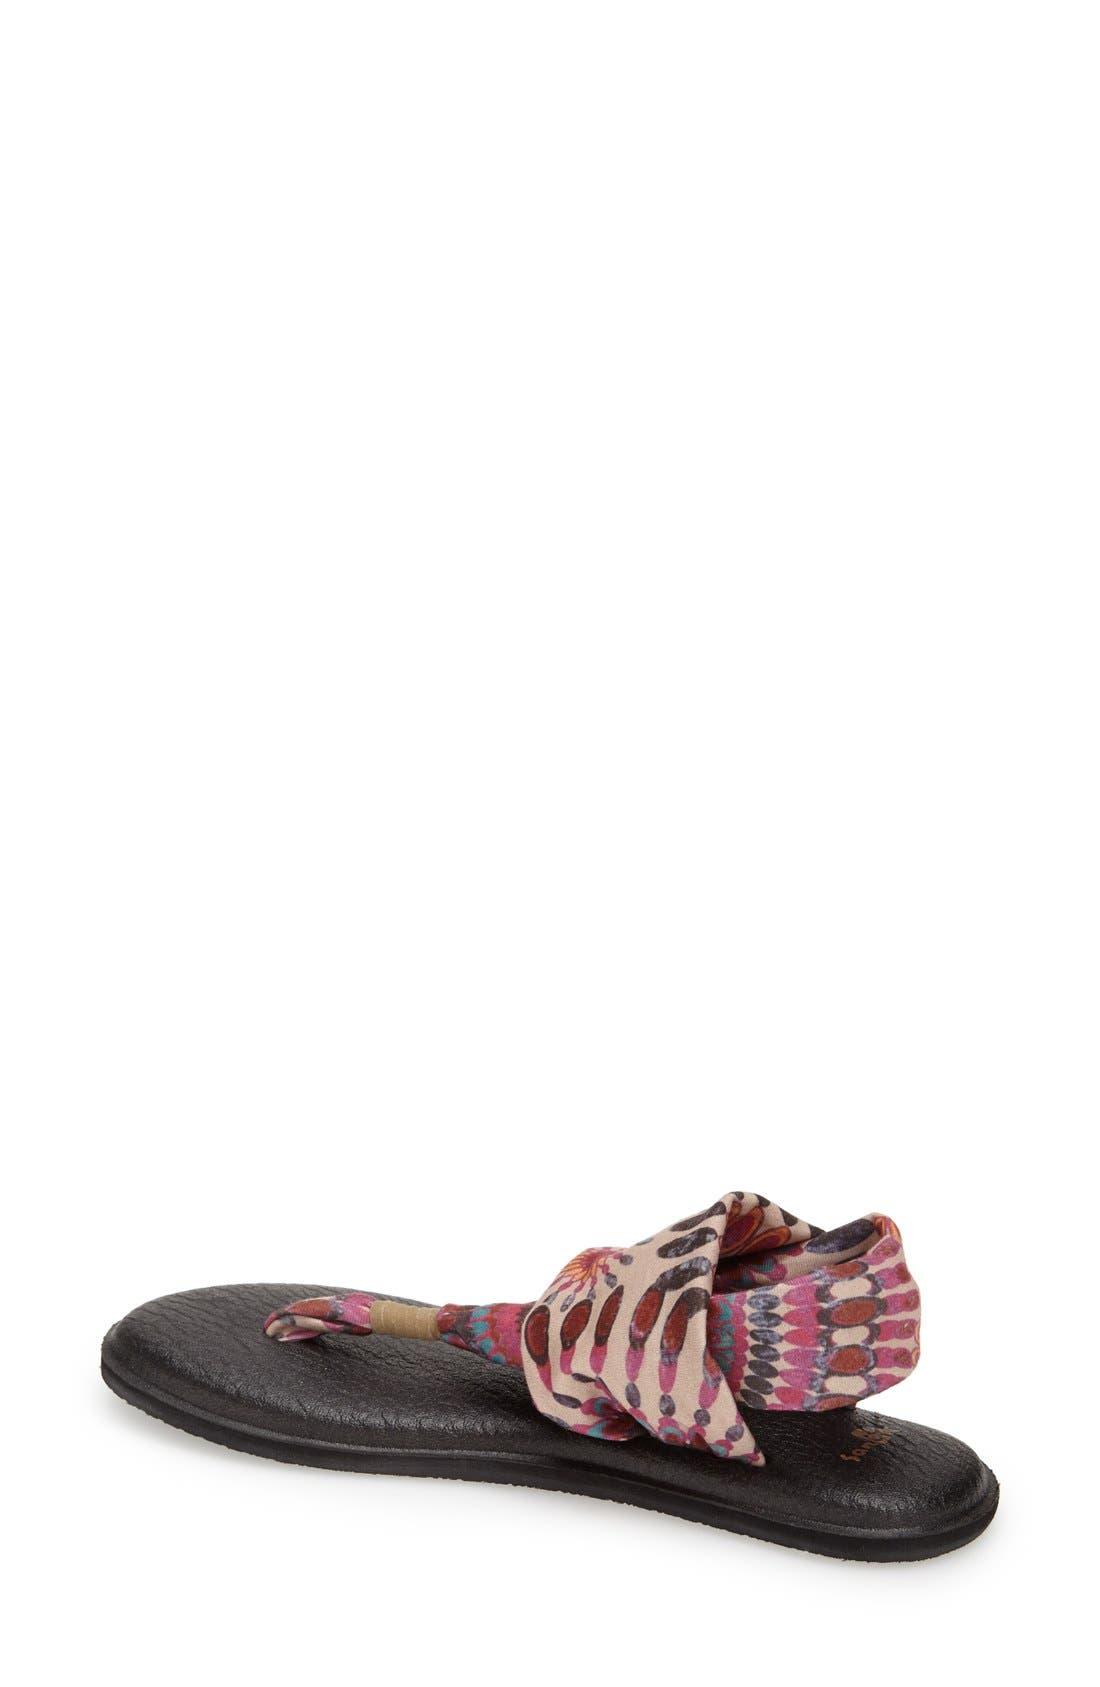 'Yoga Sling 2' Sandal,                             Alternate thumbnail 50, color,